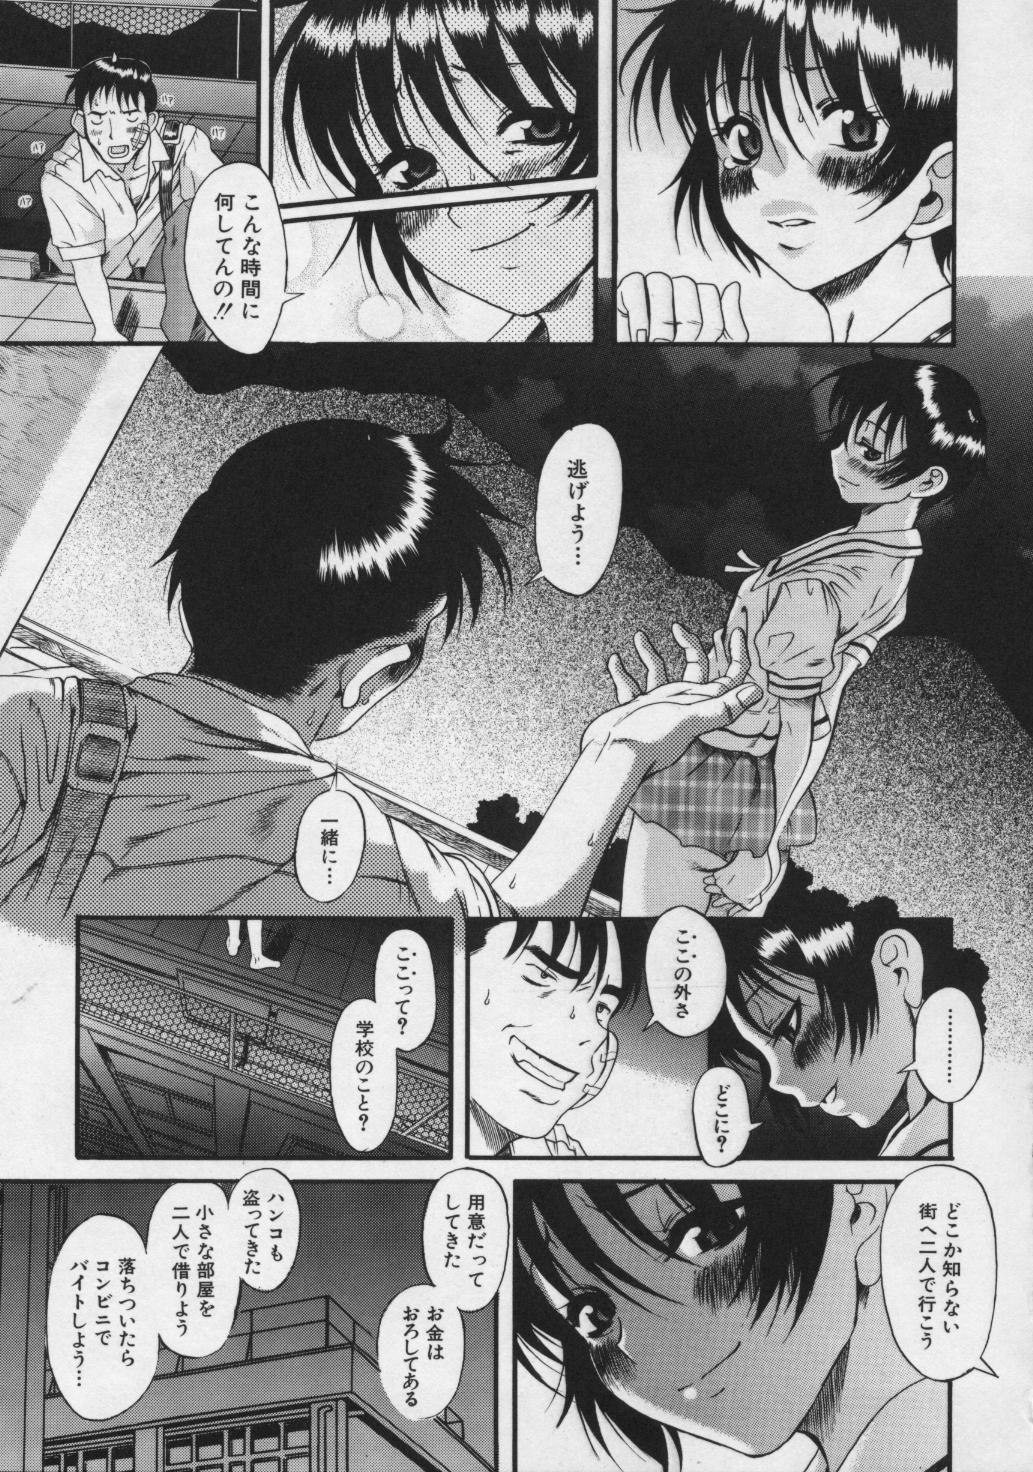 Kimi no Na o Yobeba - If I call your name. 82